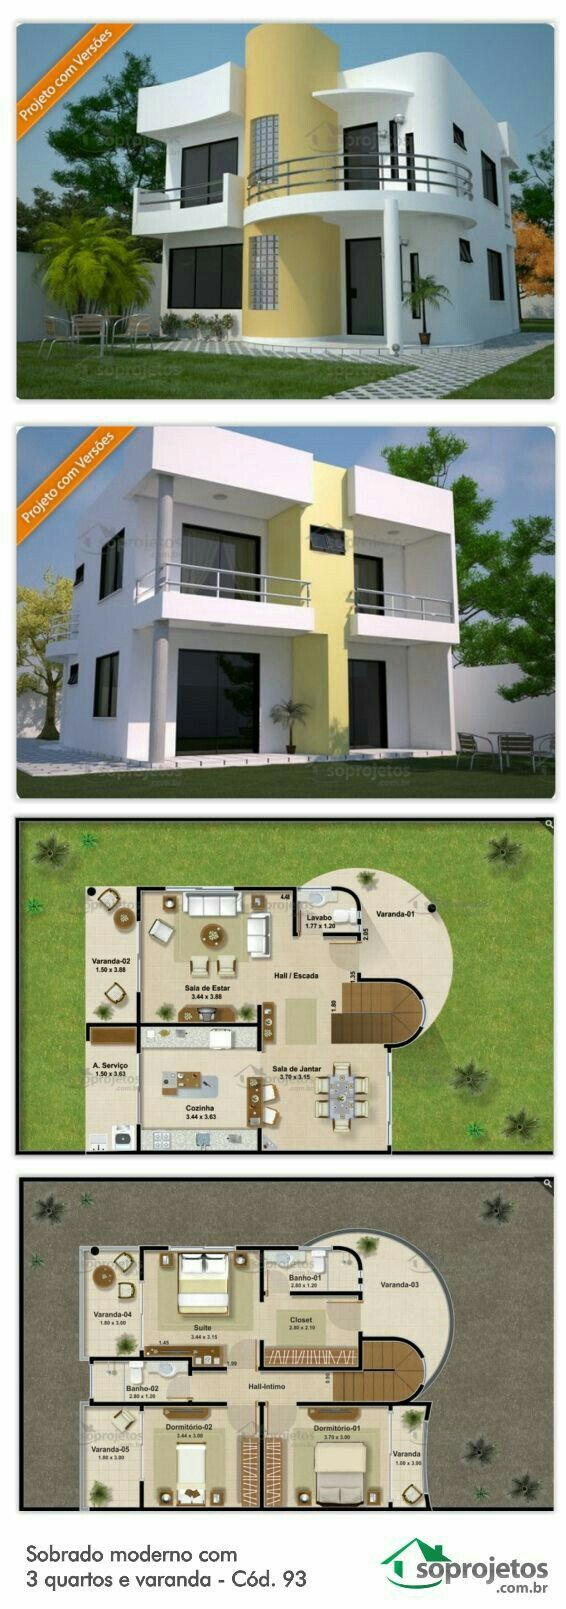 Modern House Plans Modern Houses Dream House